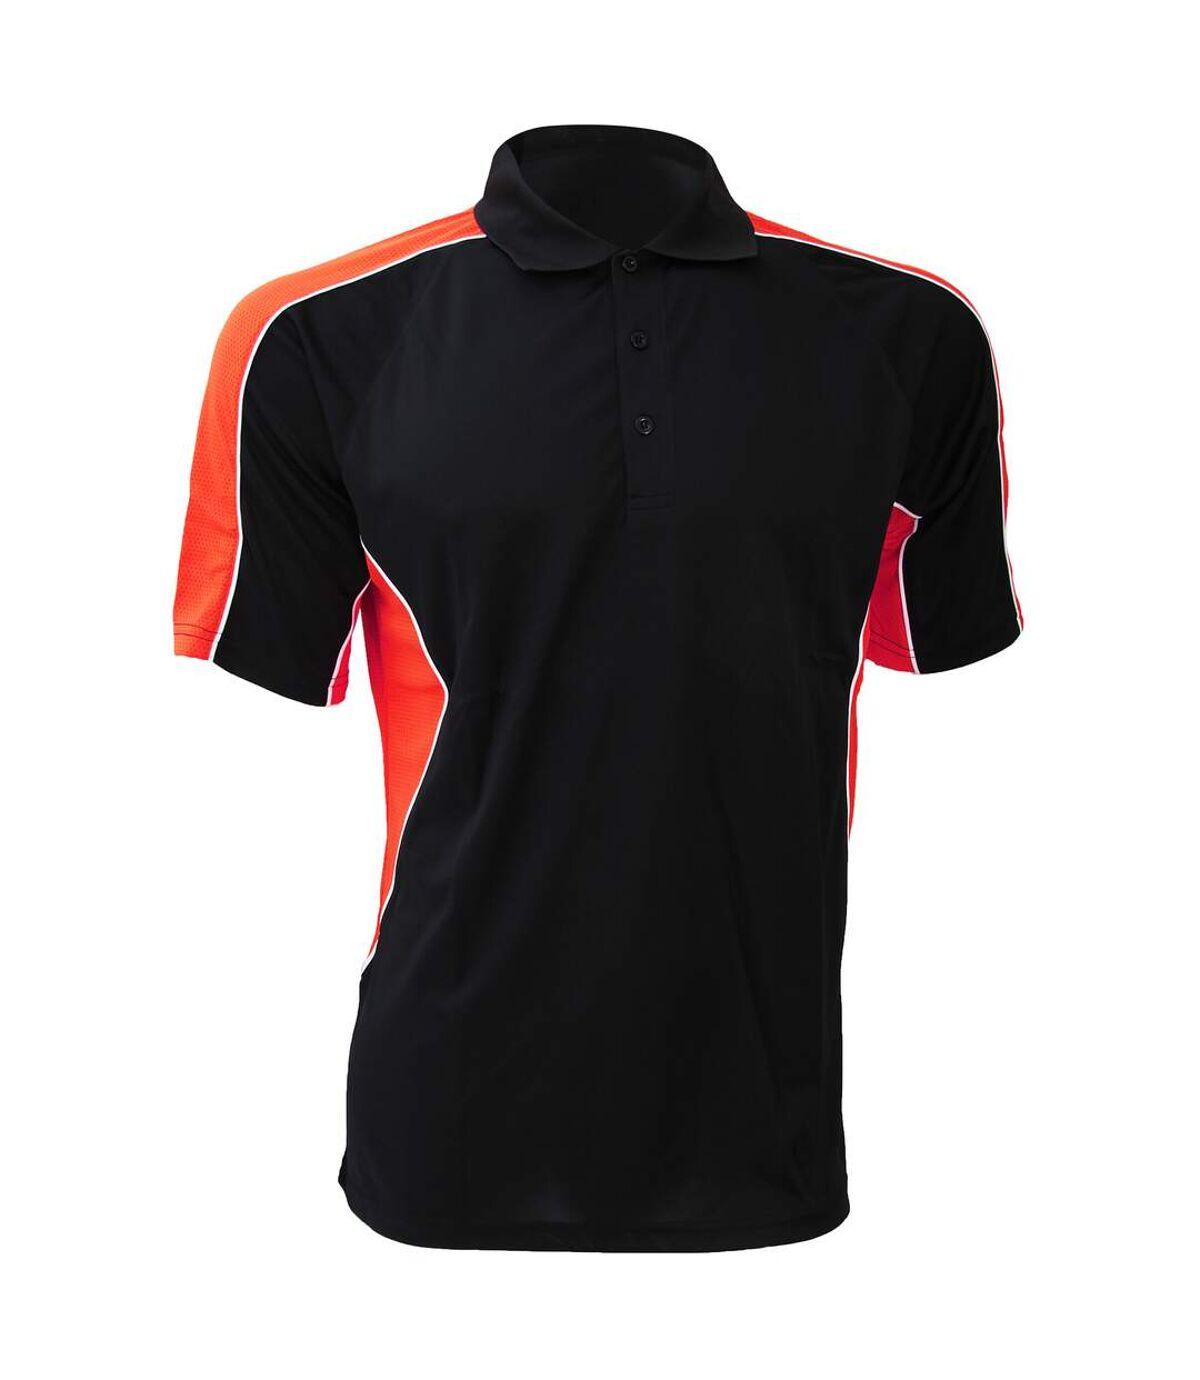 Gamegear® Cooltex Active Mens Short Sleeve Polo Shirt (Black/Red) - UTBC420